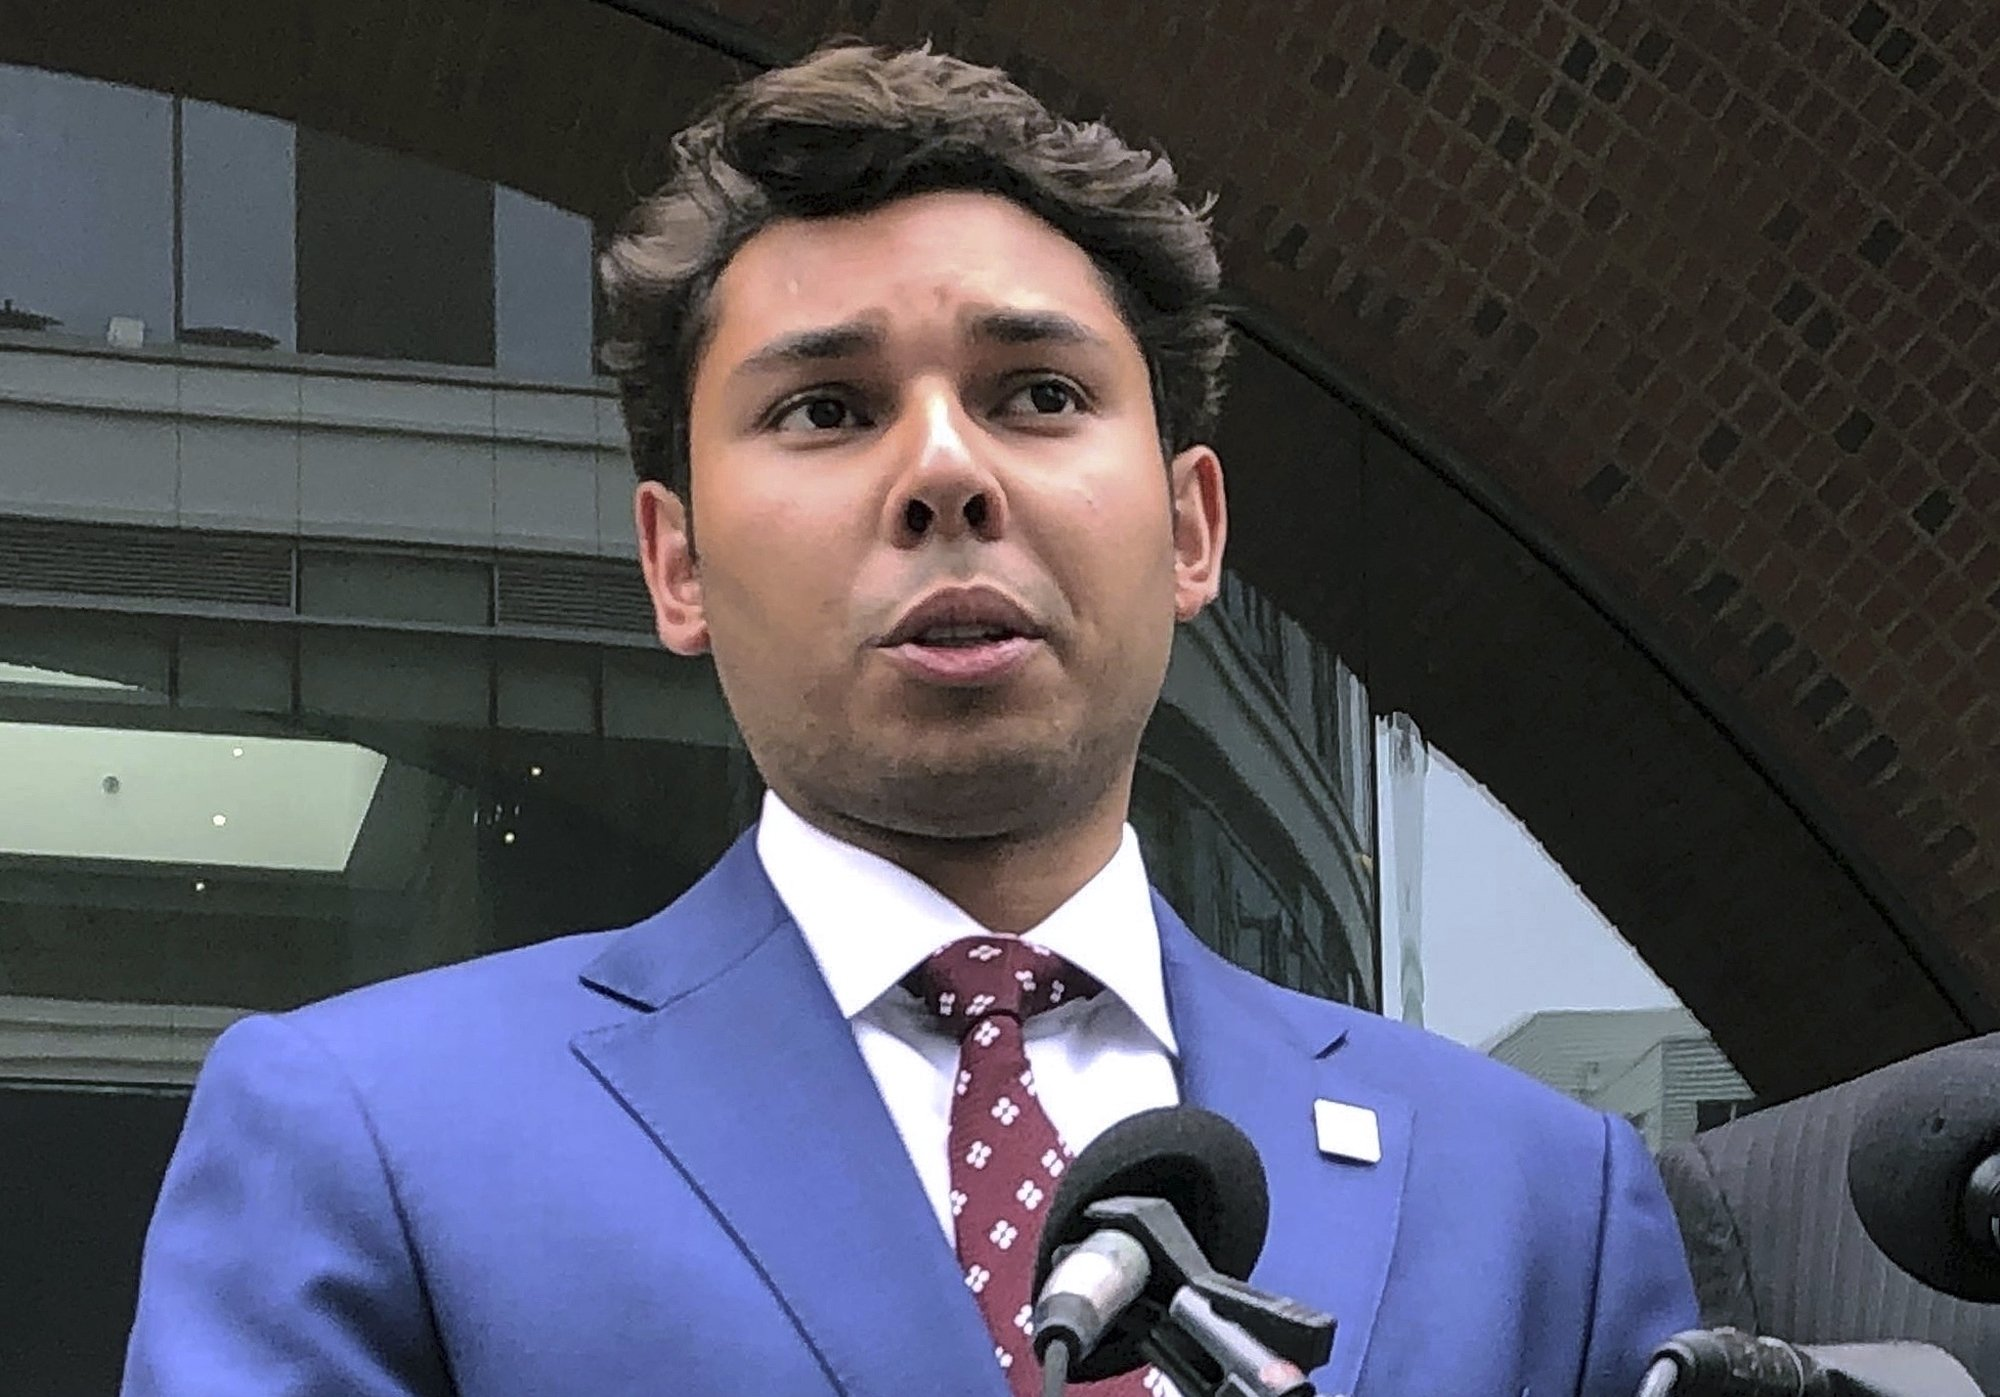 Wunderkind ex-mayor to face jurors in fraud, bribery case